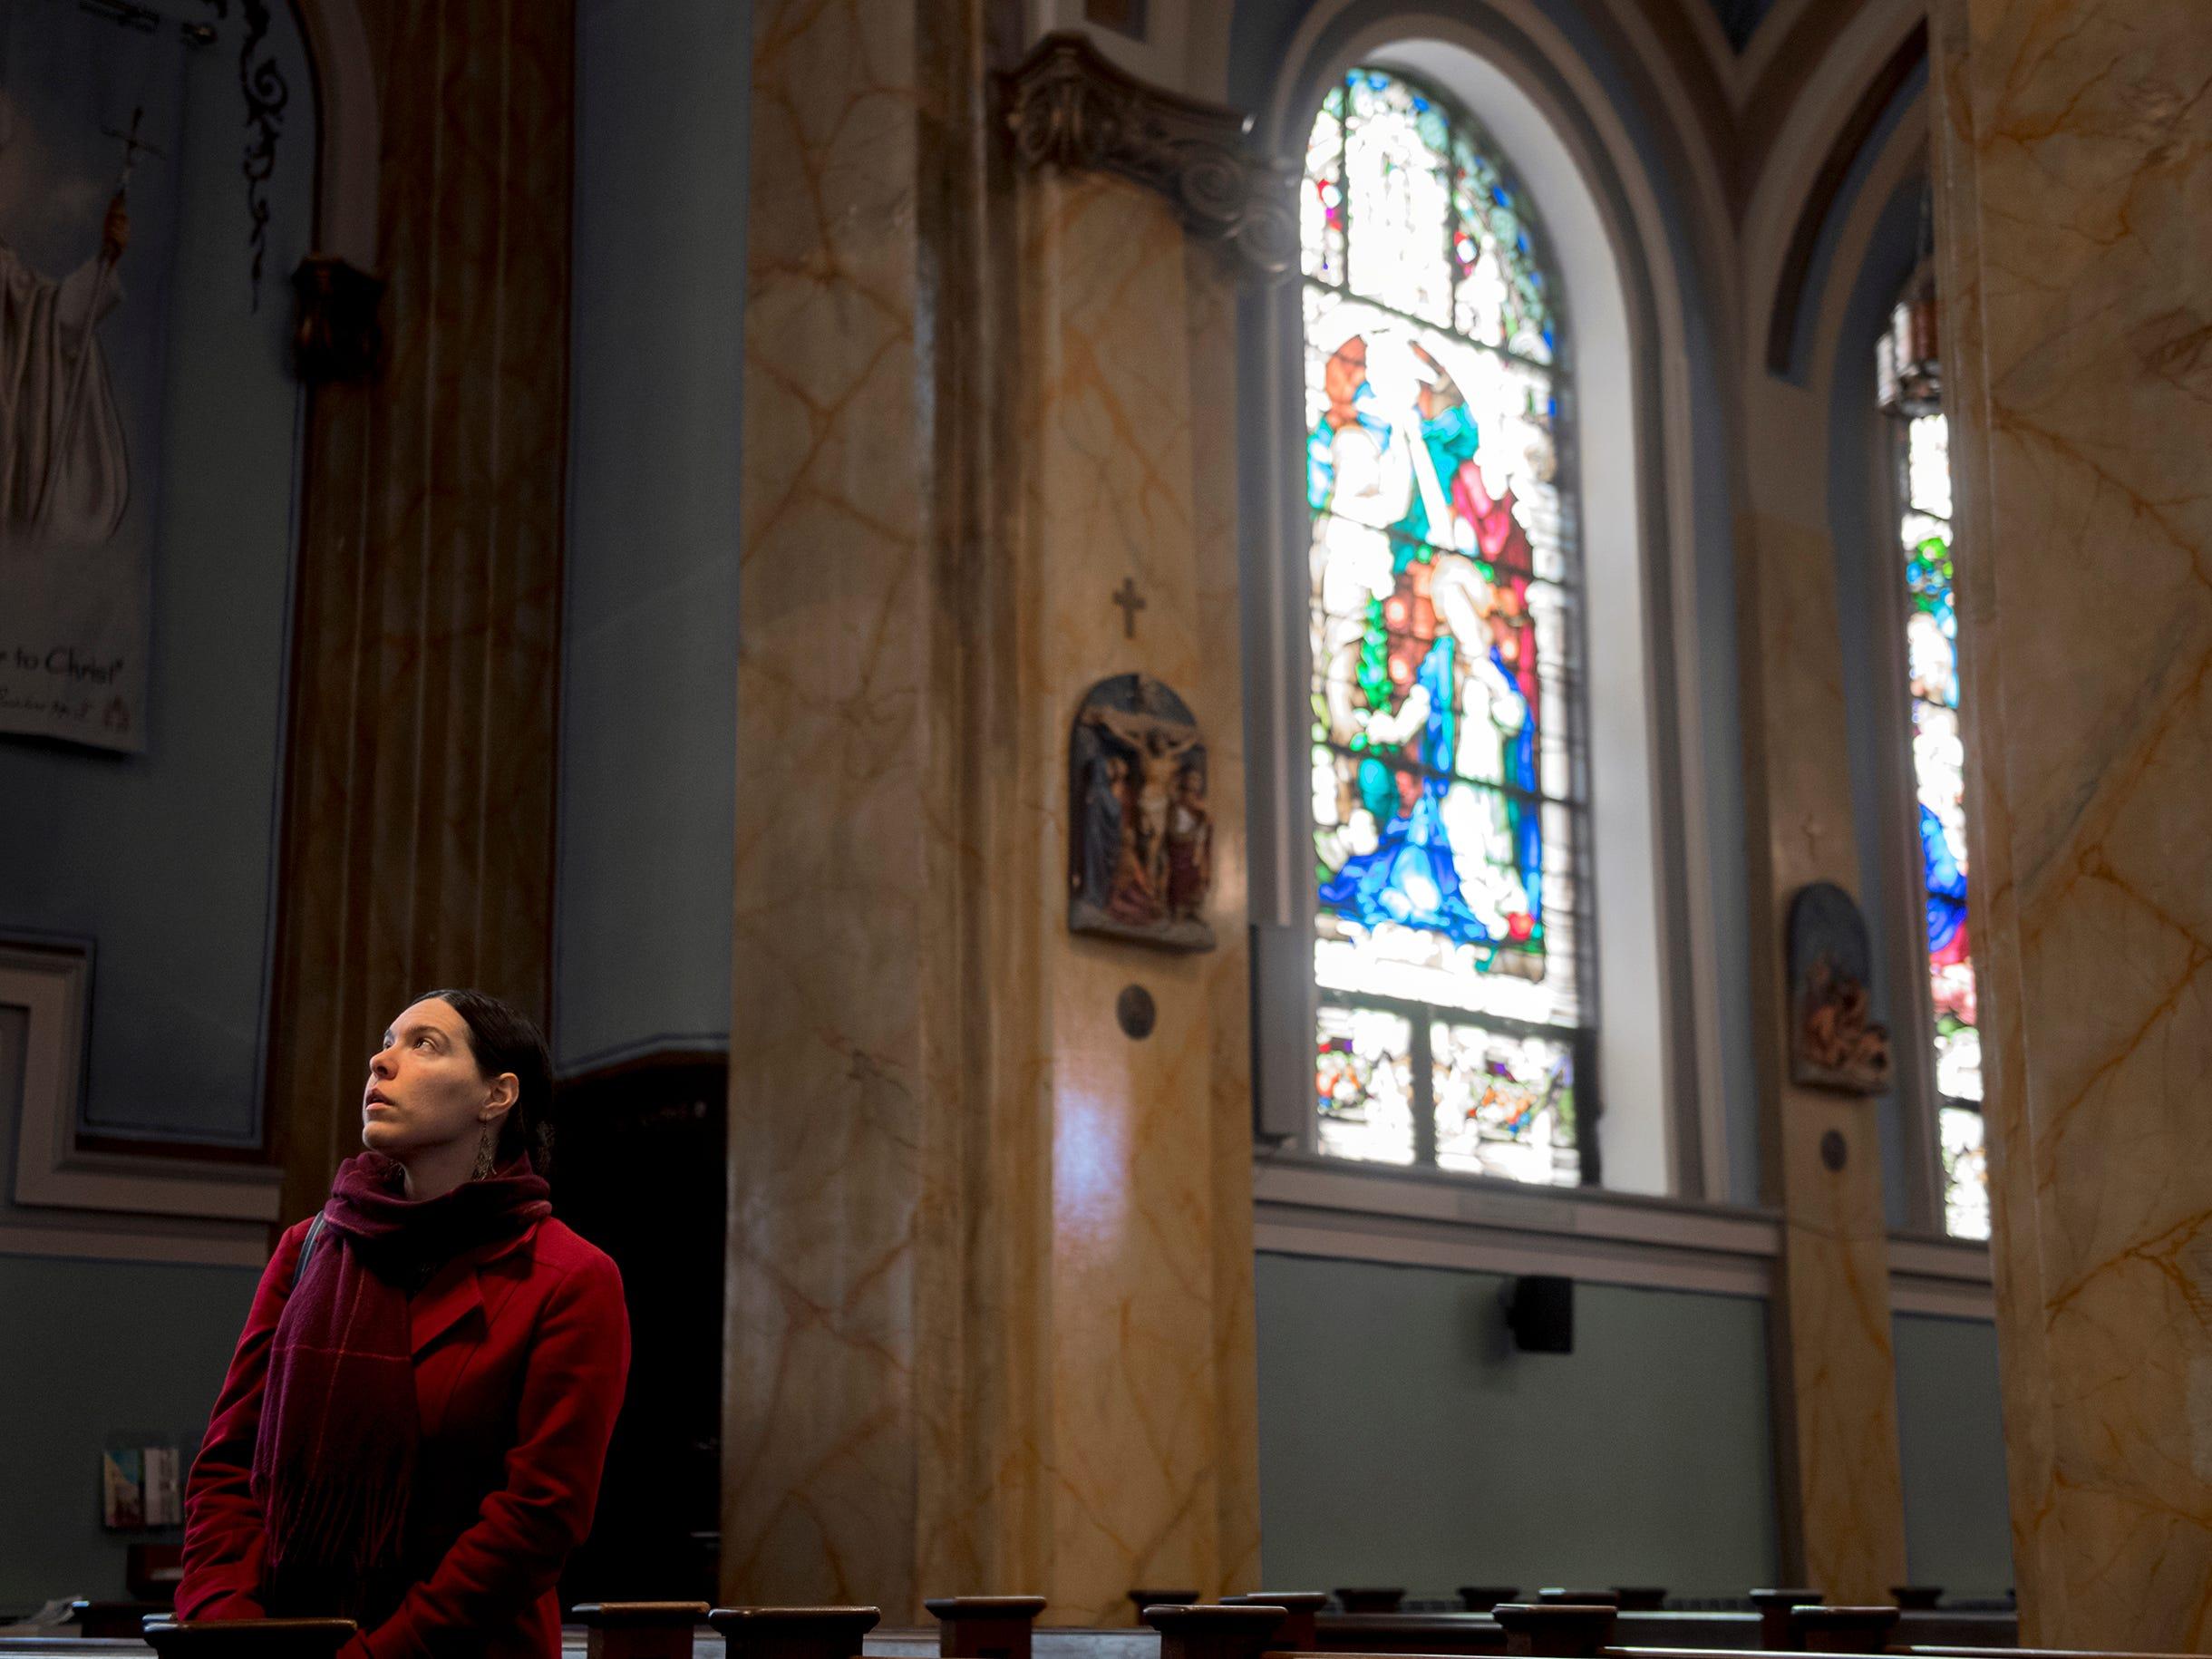 Bonny Beth Elwell of the Camden County Historical Society looks around inside St. Joseph Roman Catholic Church Thursday, Feb. 28, 2019 in Camden, N.J.